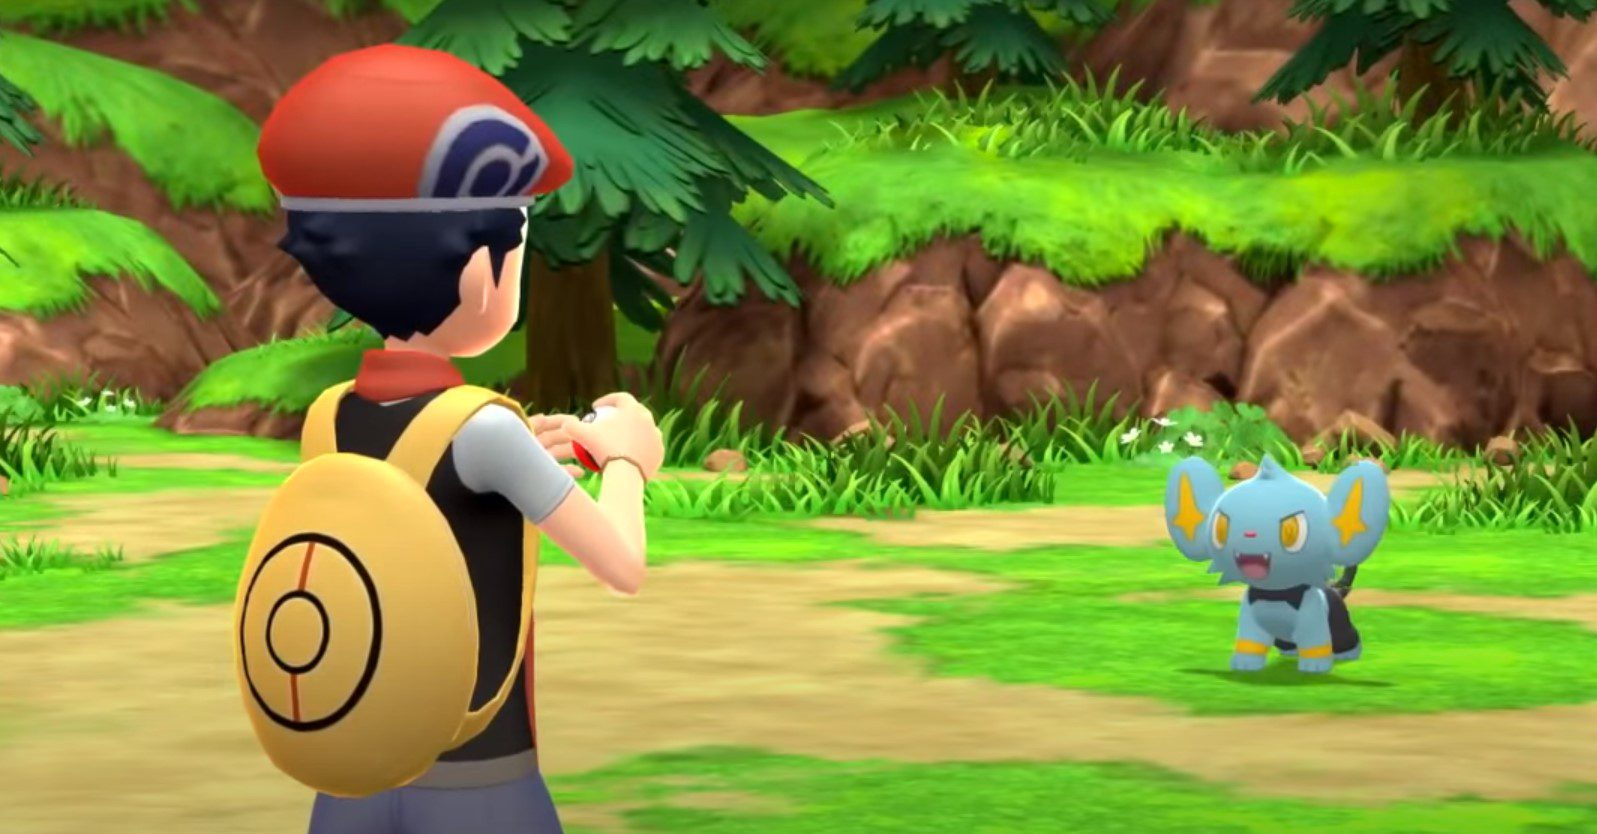 Pokémon brilliant diamond and shining pearl release date